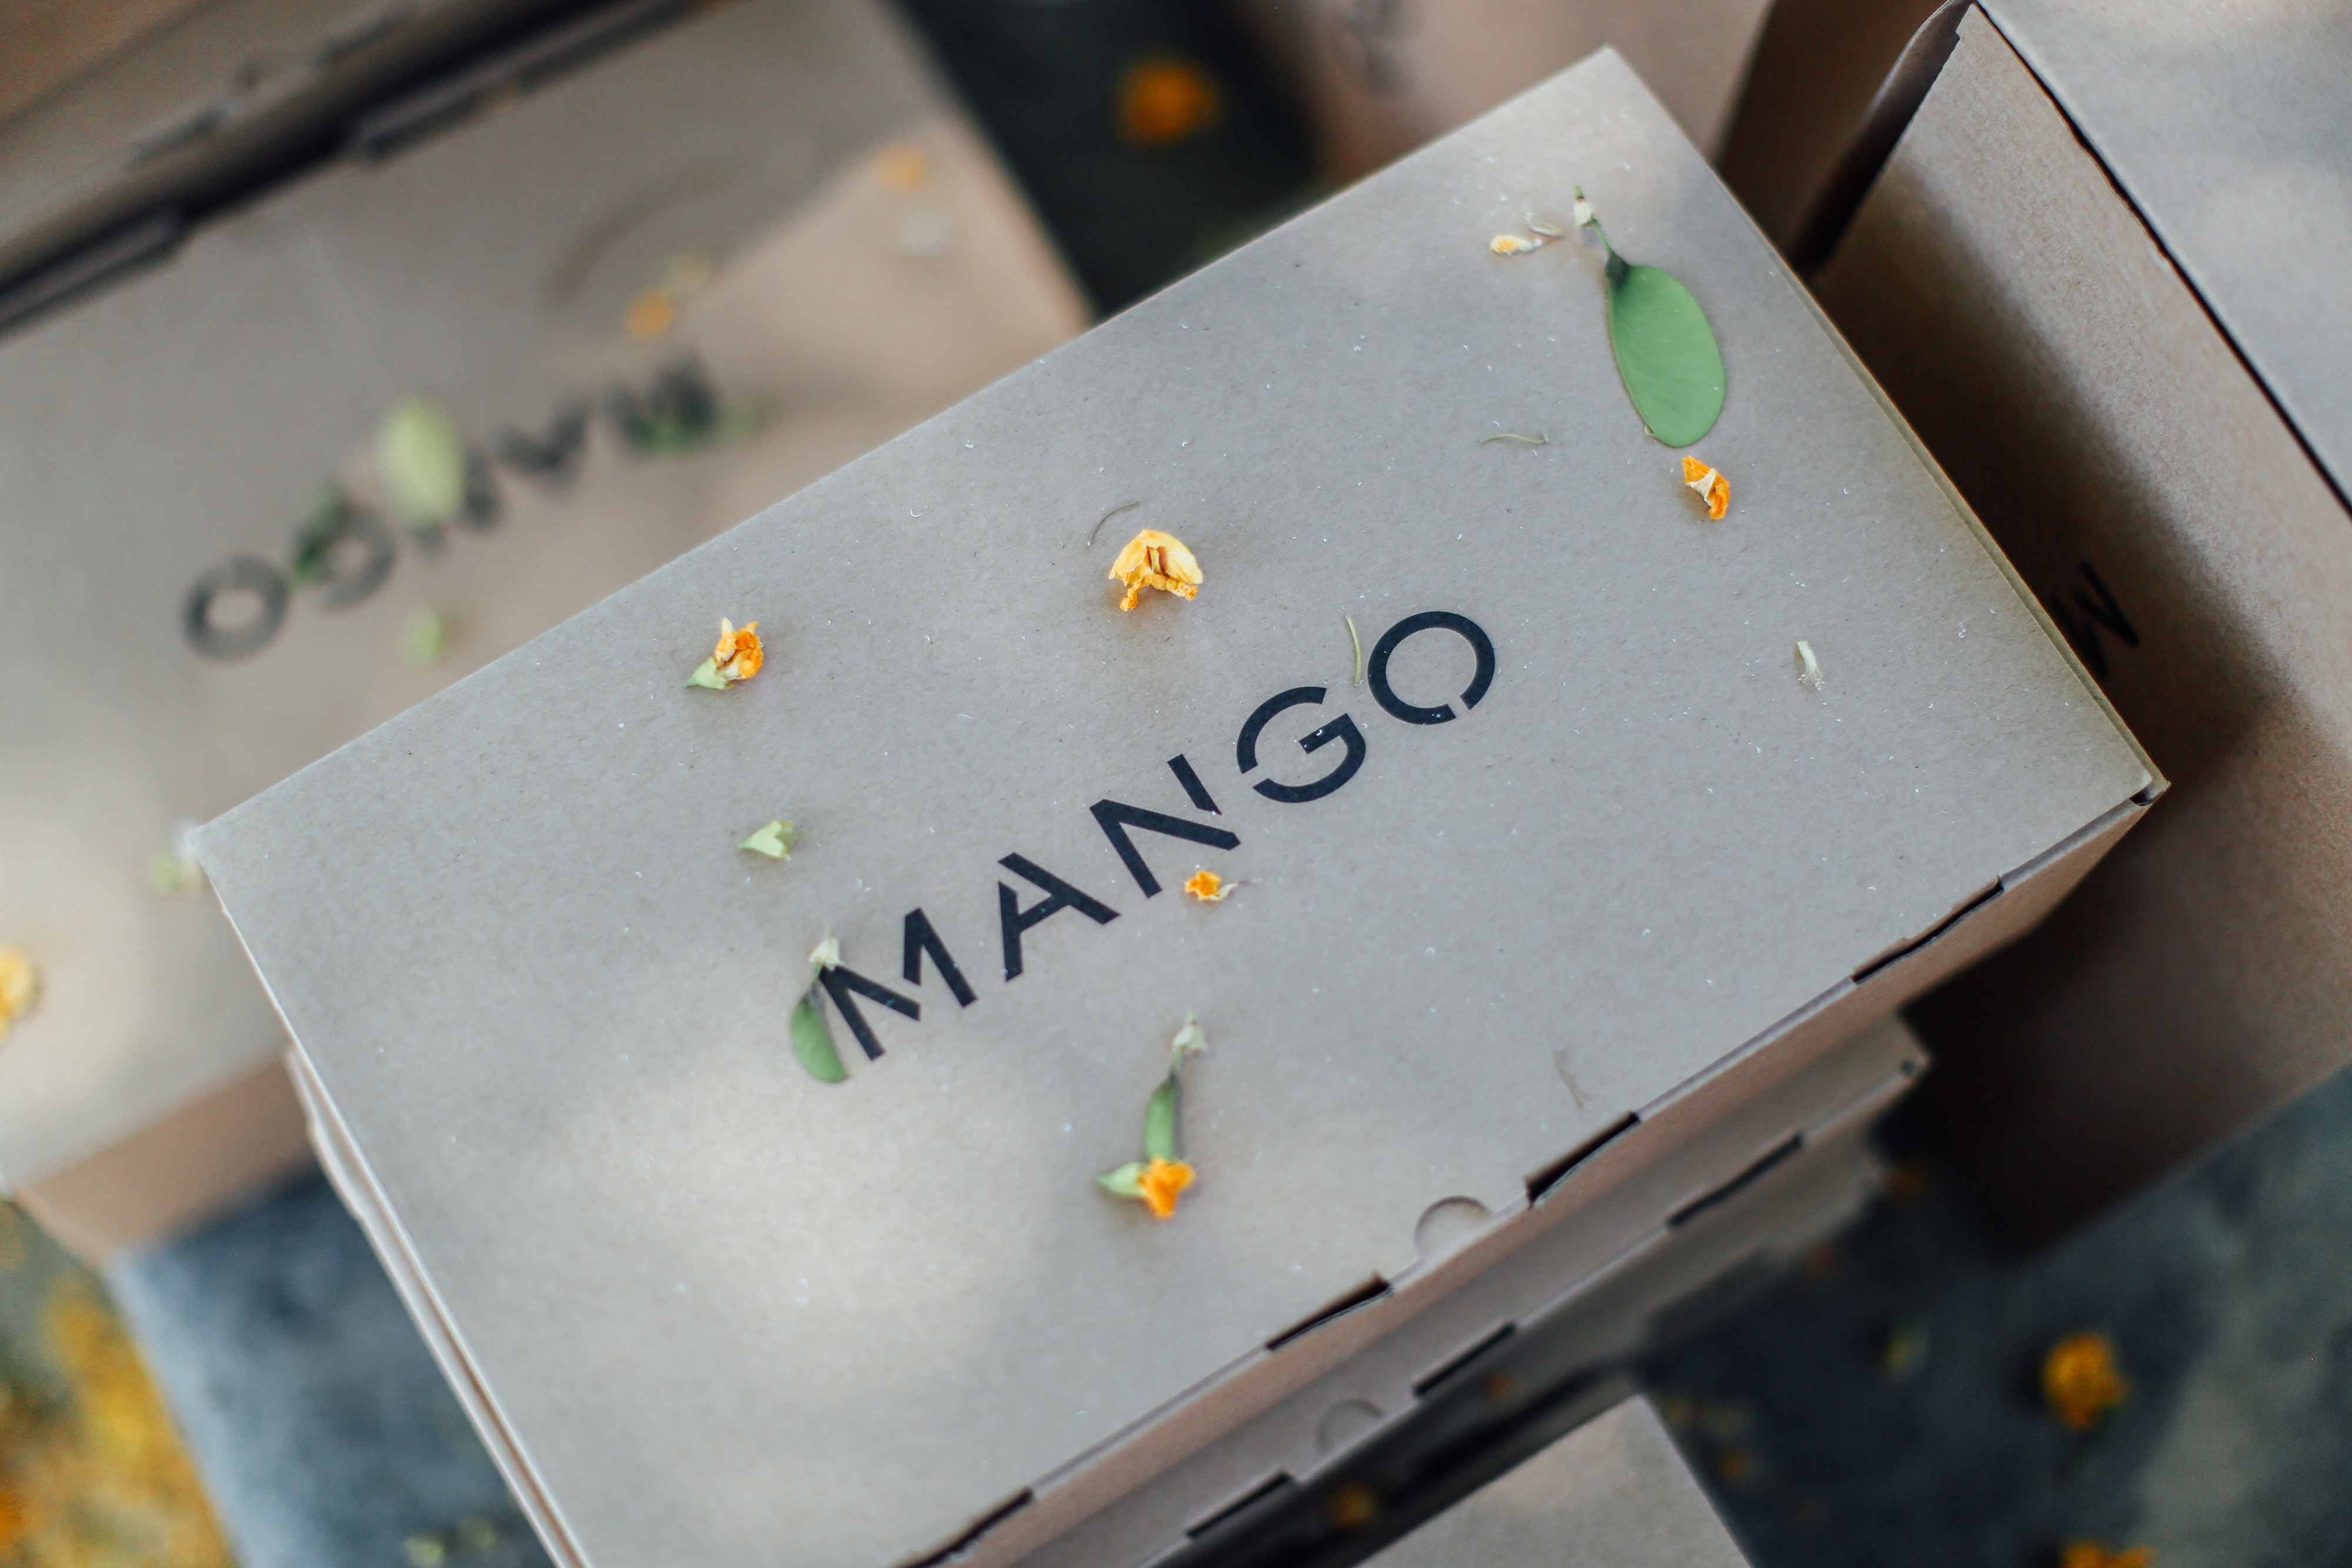 _mango_show_080_barcelona_mango_man_080Mango-cupofcouple-0039